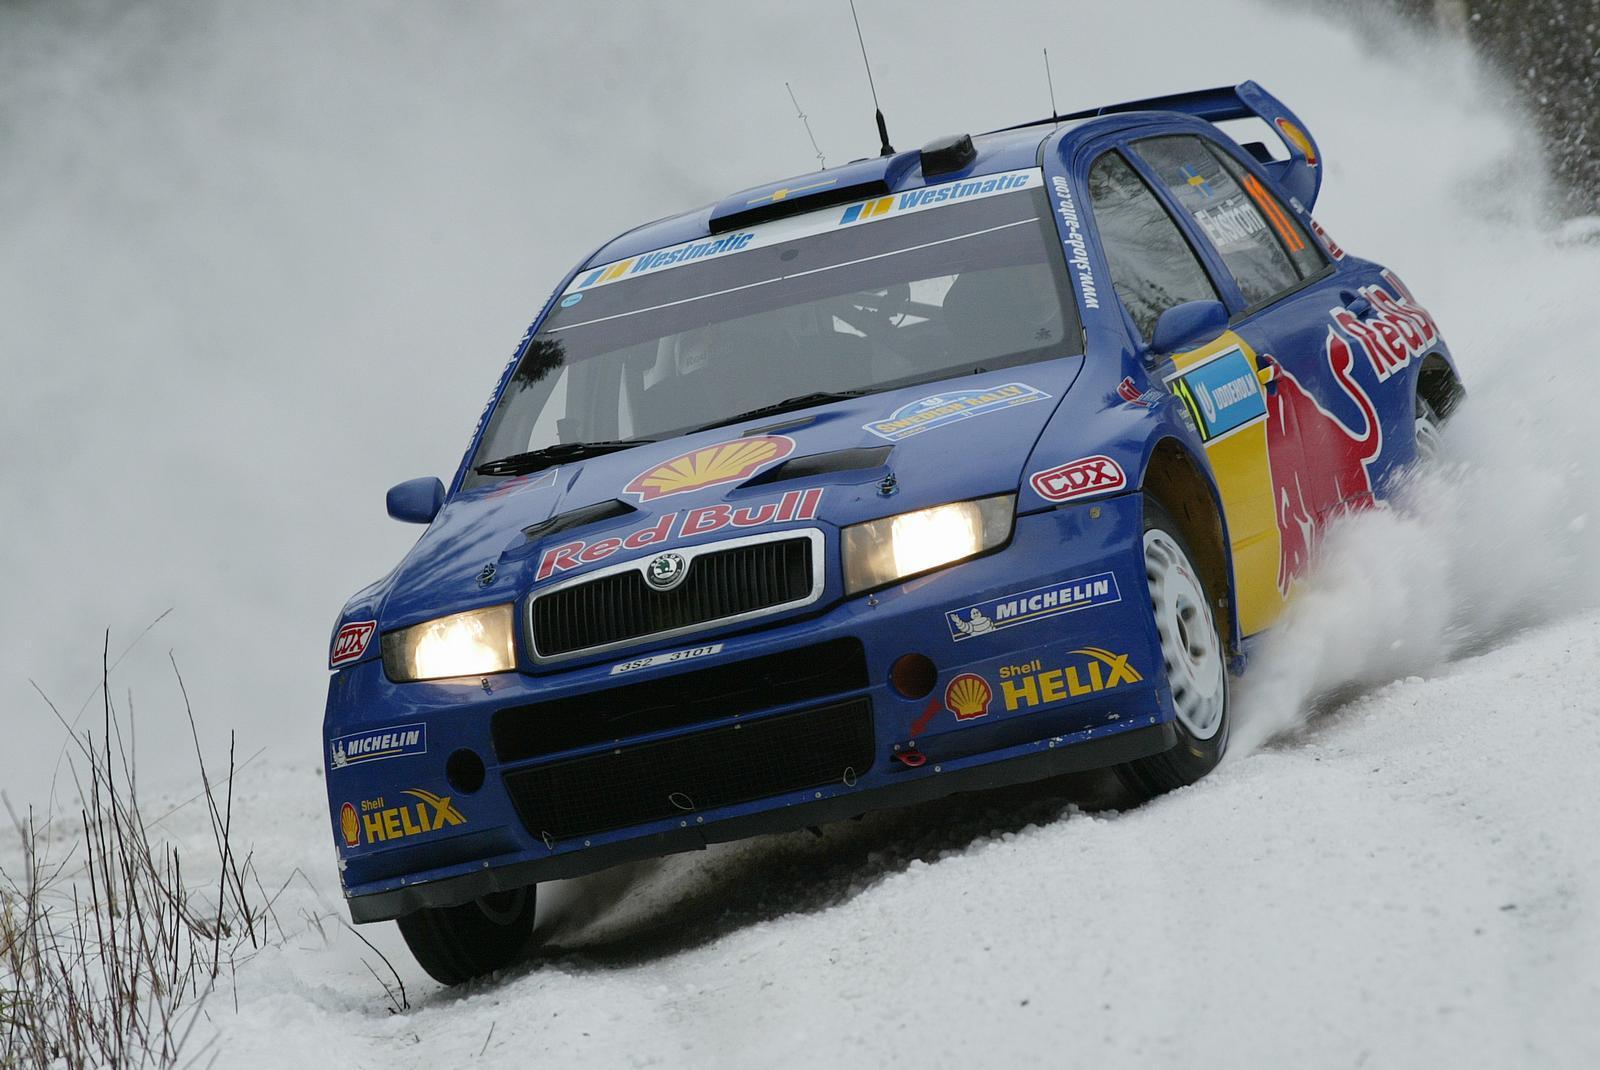 Skoda-Fabia_WRC_mp49_pic_28958.jpg